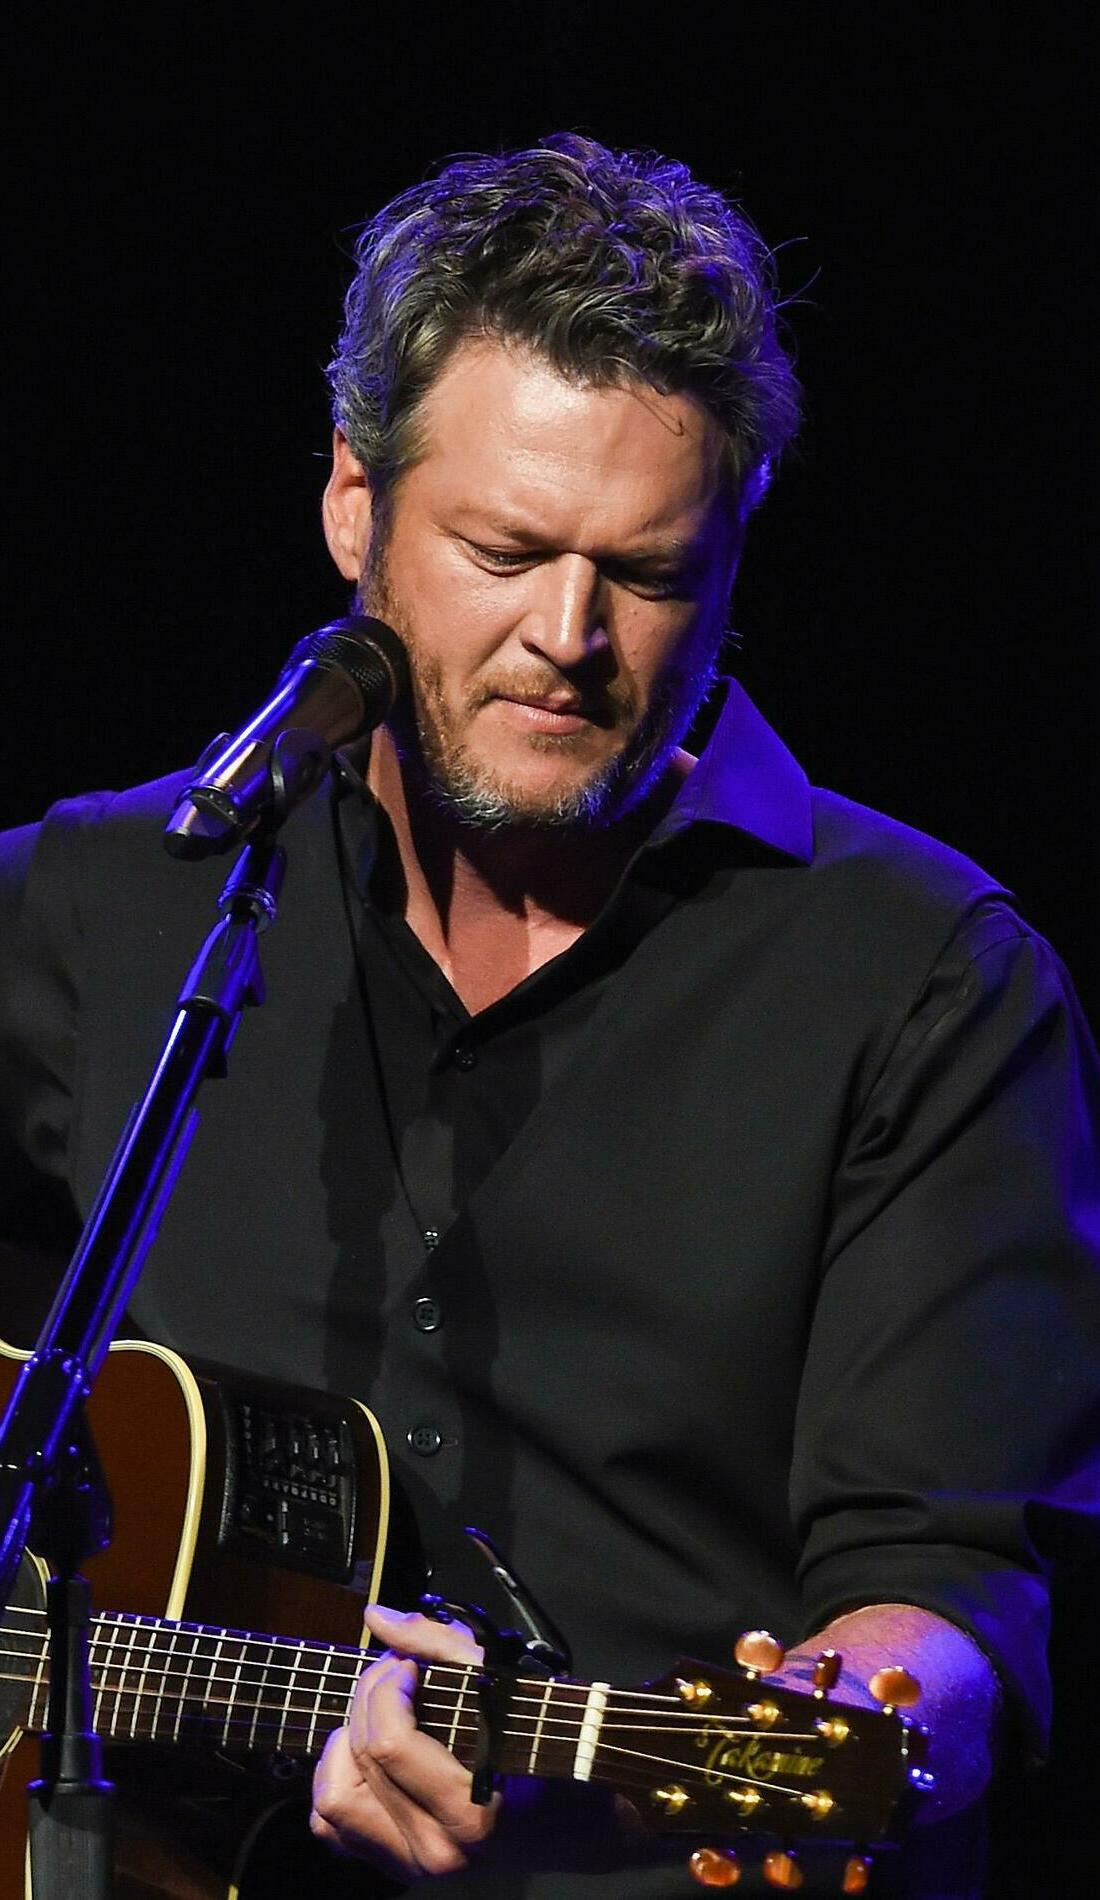 A Blake Shelton live event